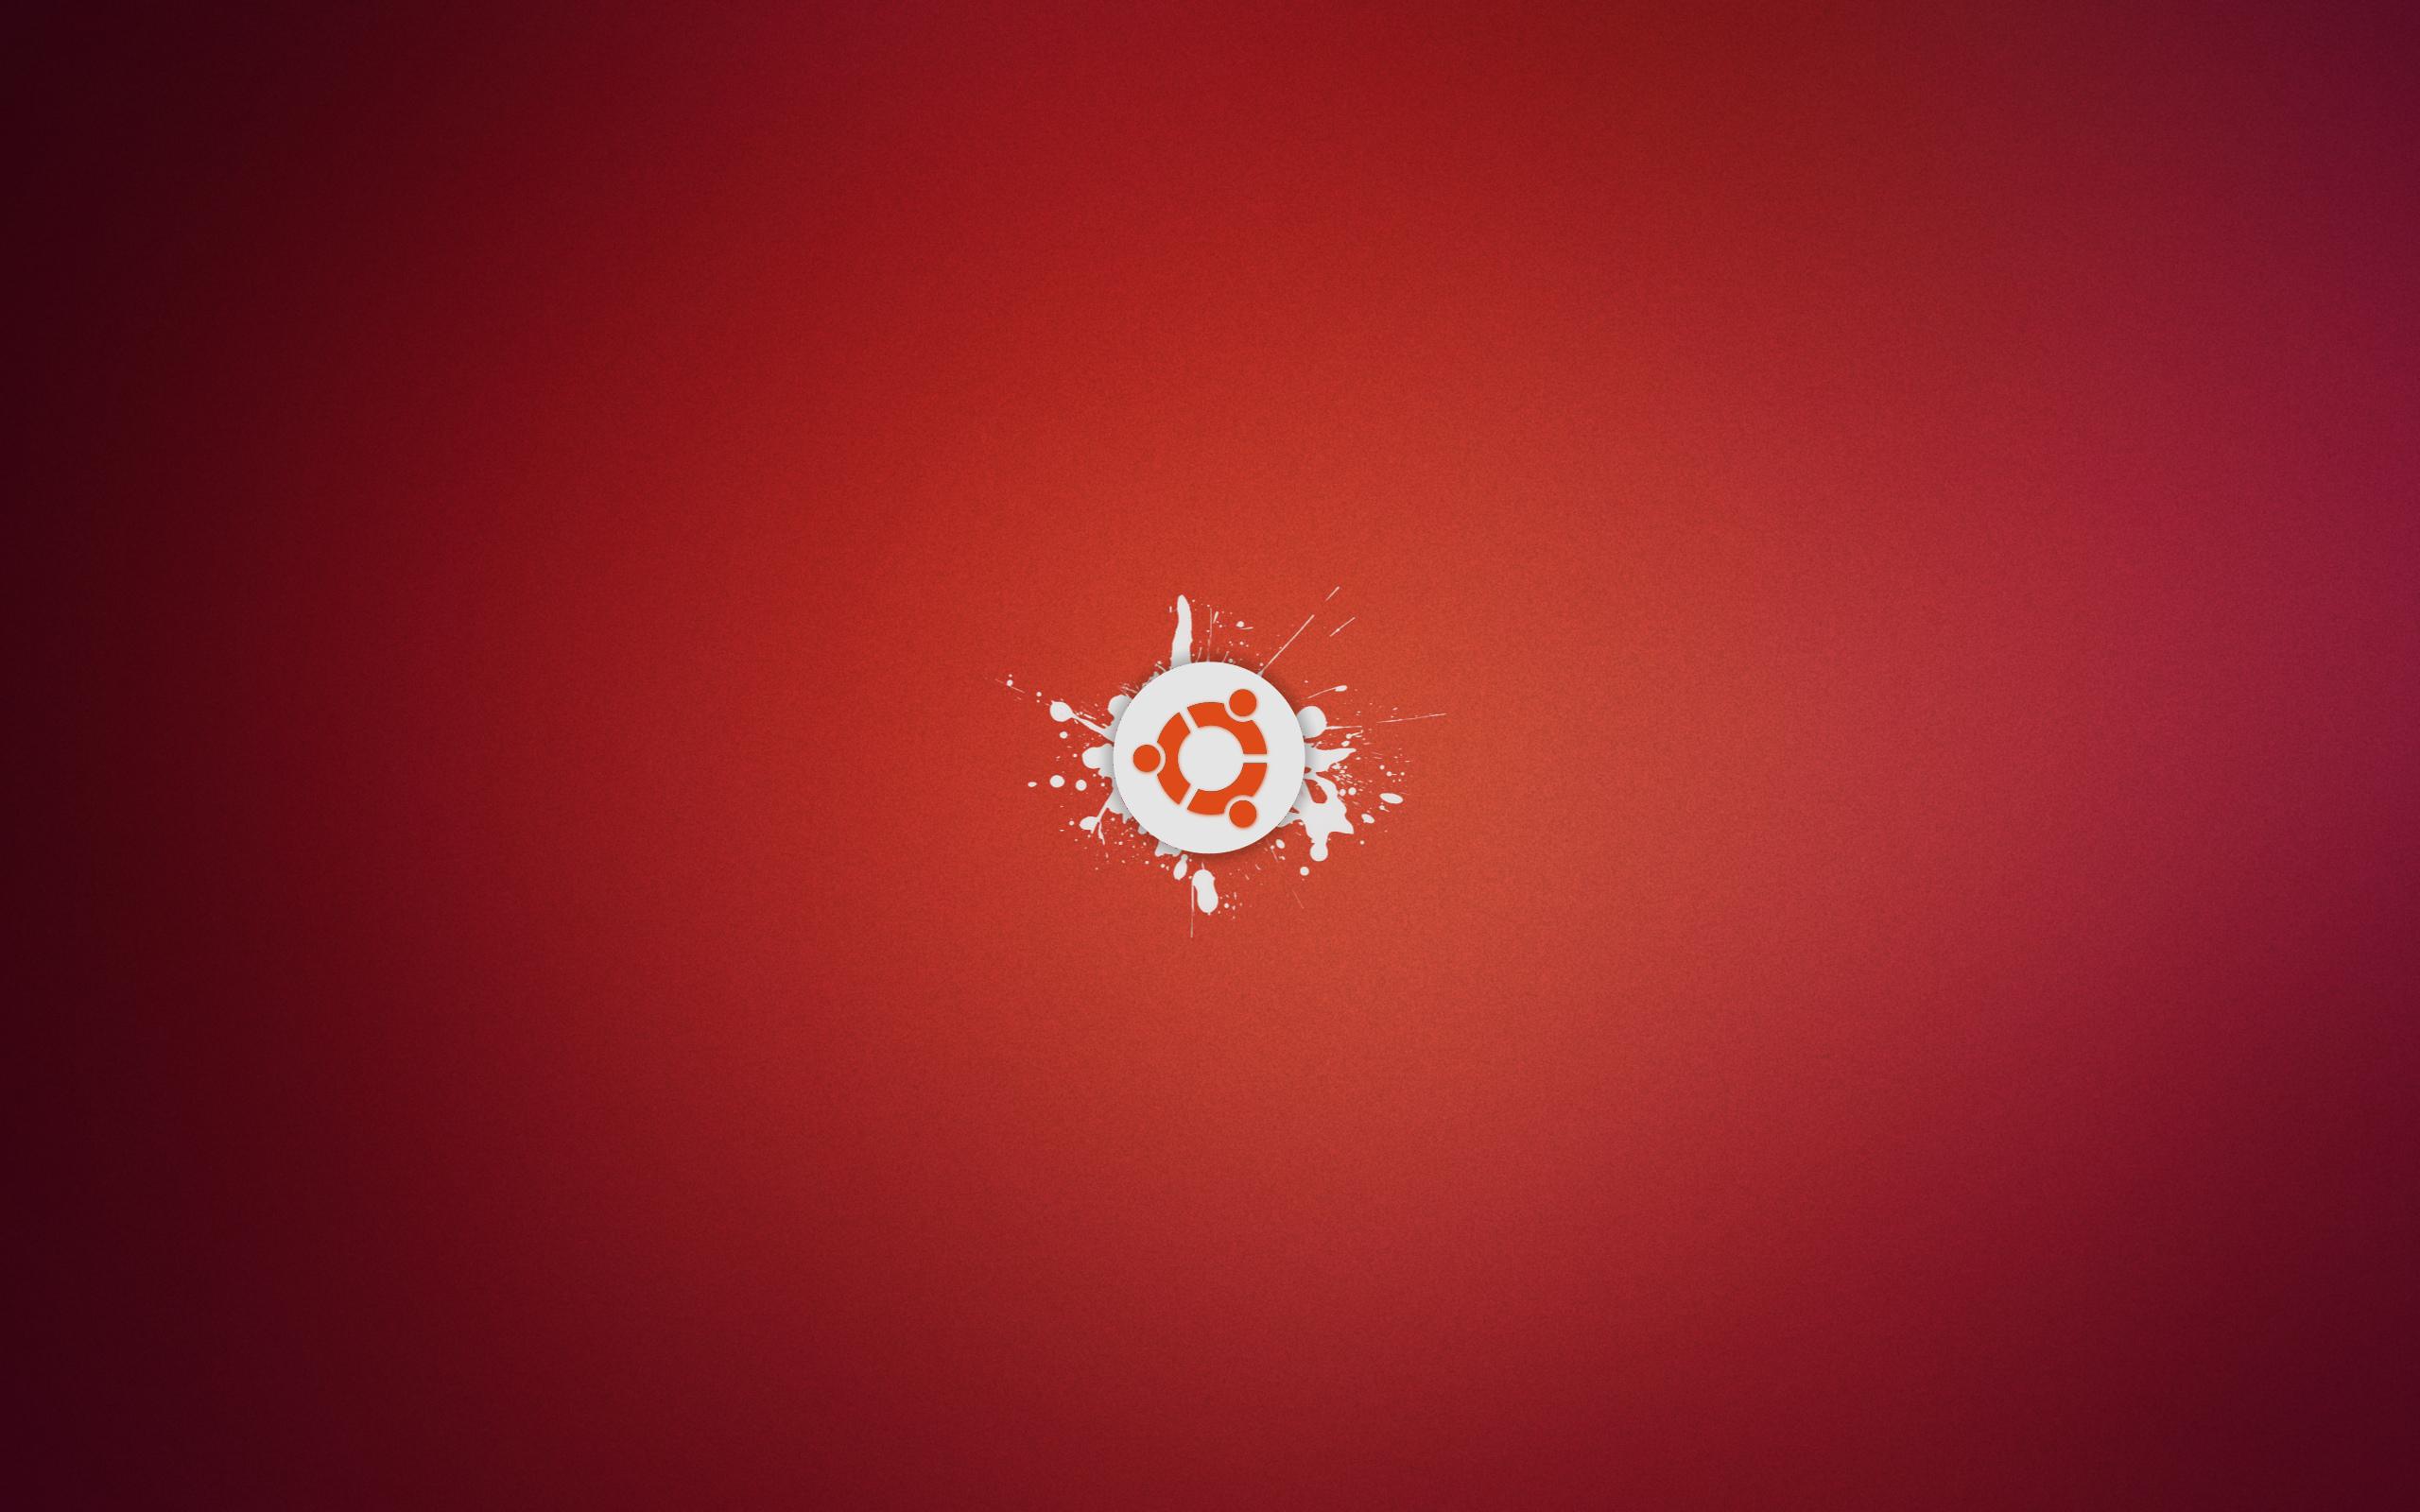 Ubuntu wallpaper 2560x1600